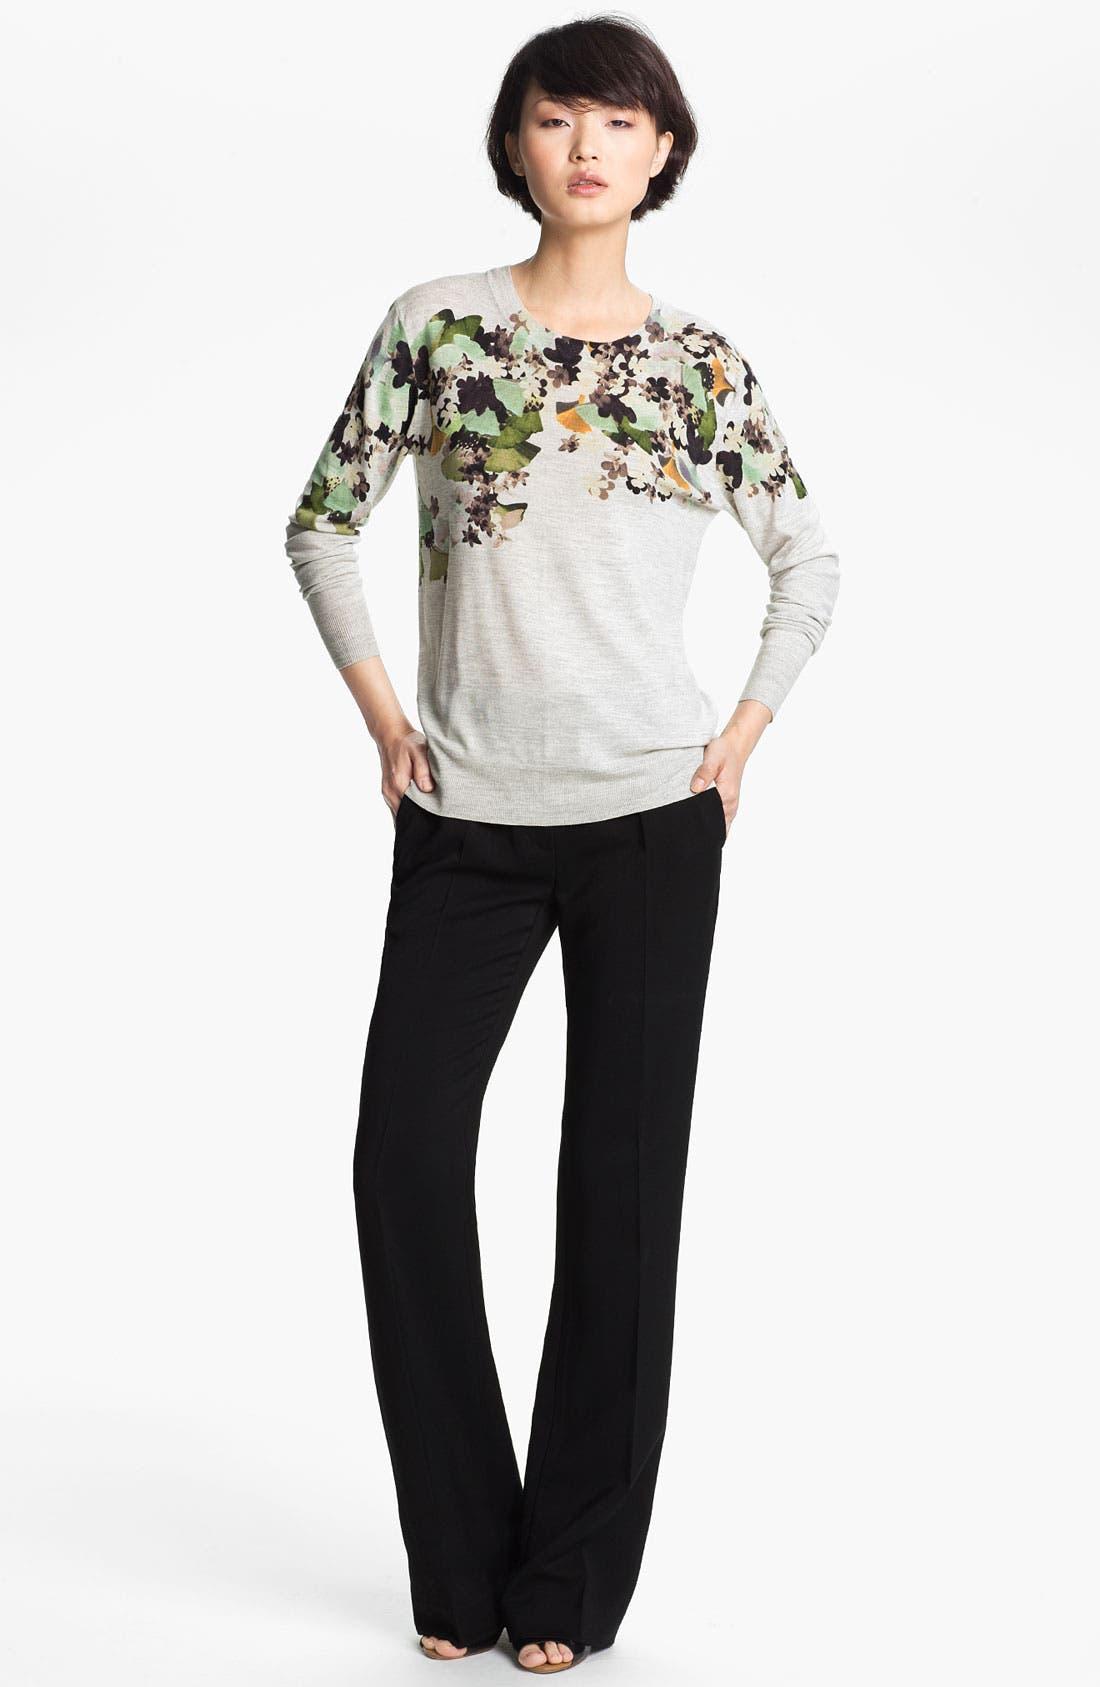 Main Image - 3.1 Phillip Lim Floral Print Sweater